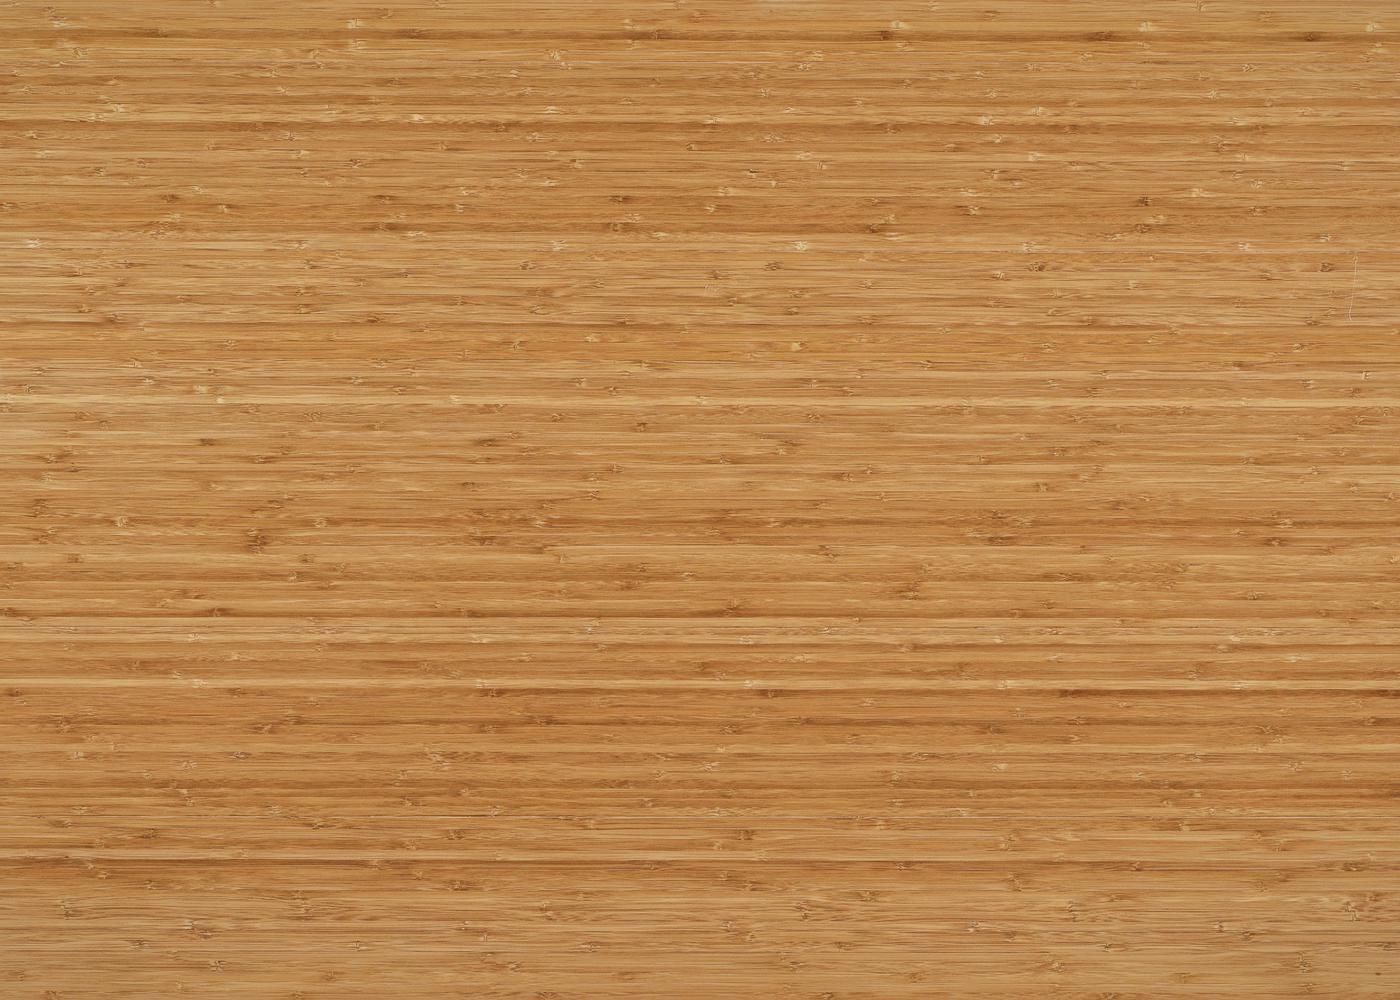 Parquet bambou contrecollé Café Vertical vernis Click 10x128x960